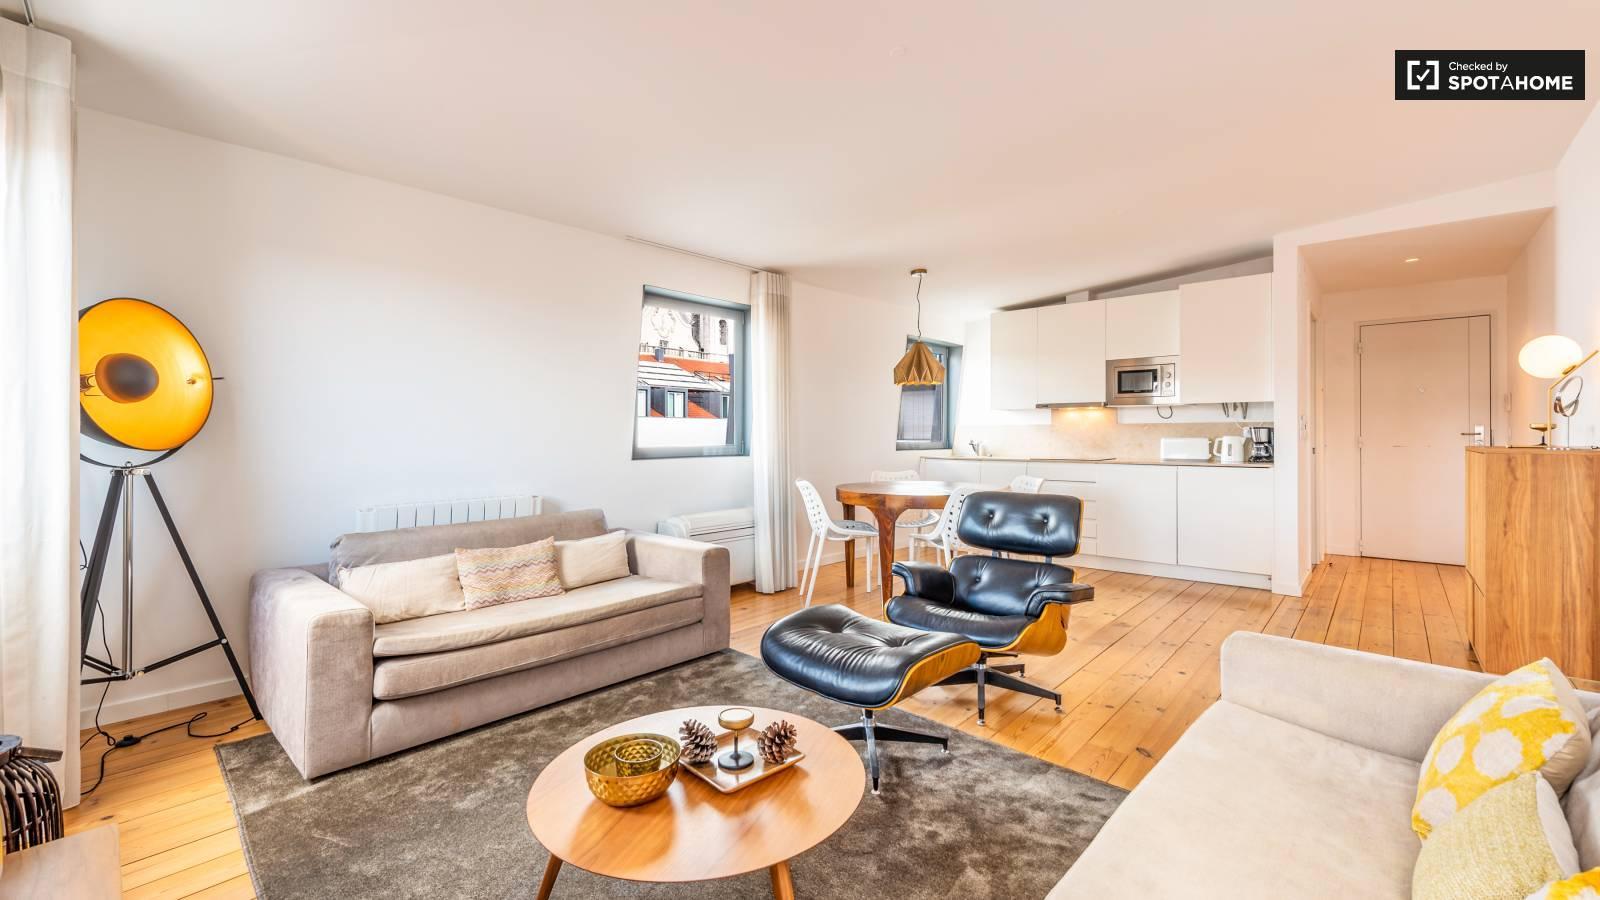 Lujoso y moderno salón-cocina en un apartamento de Lisboa